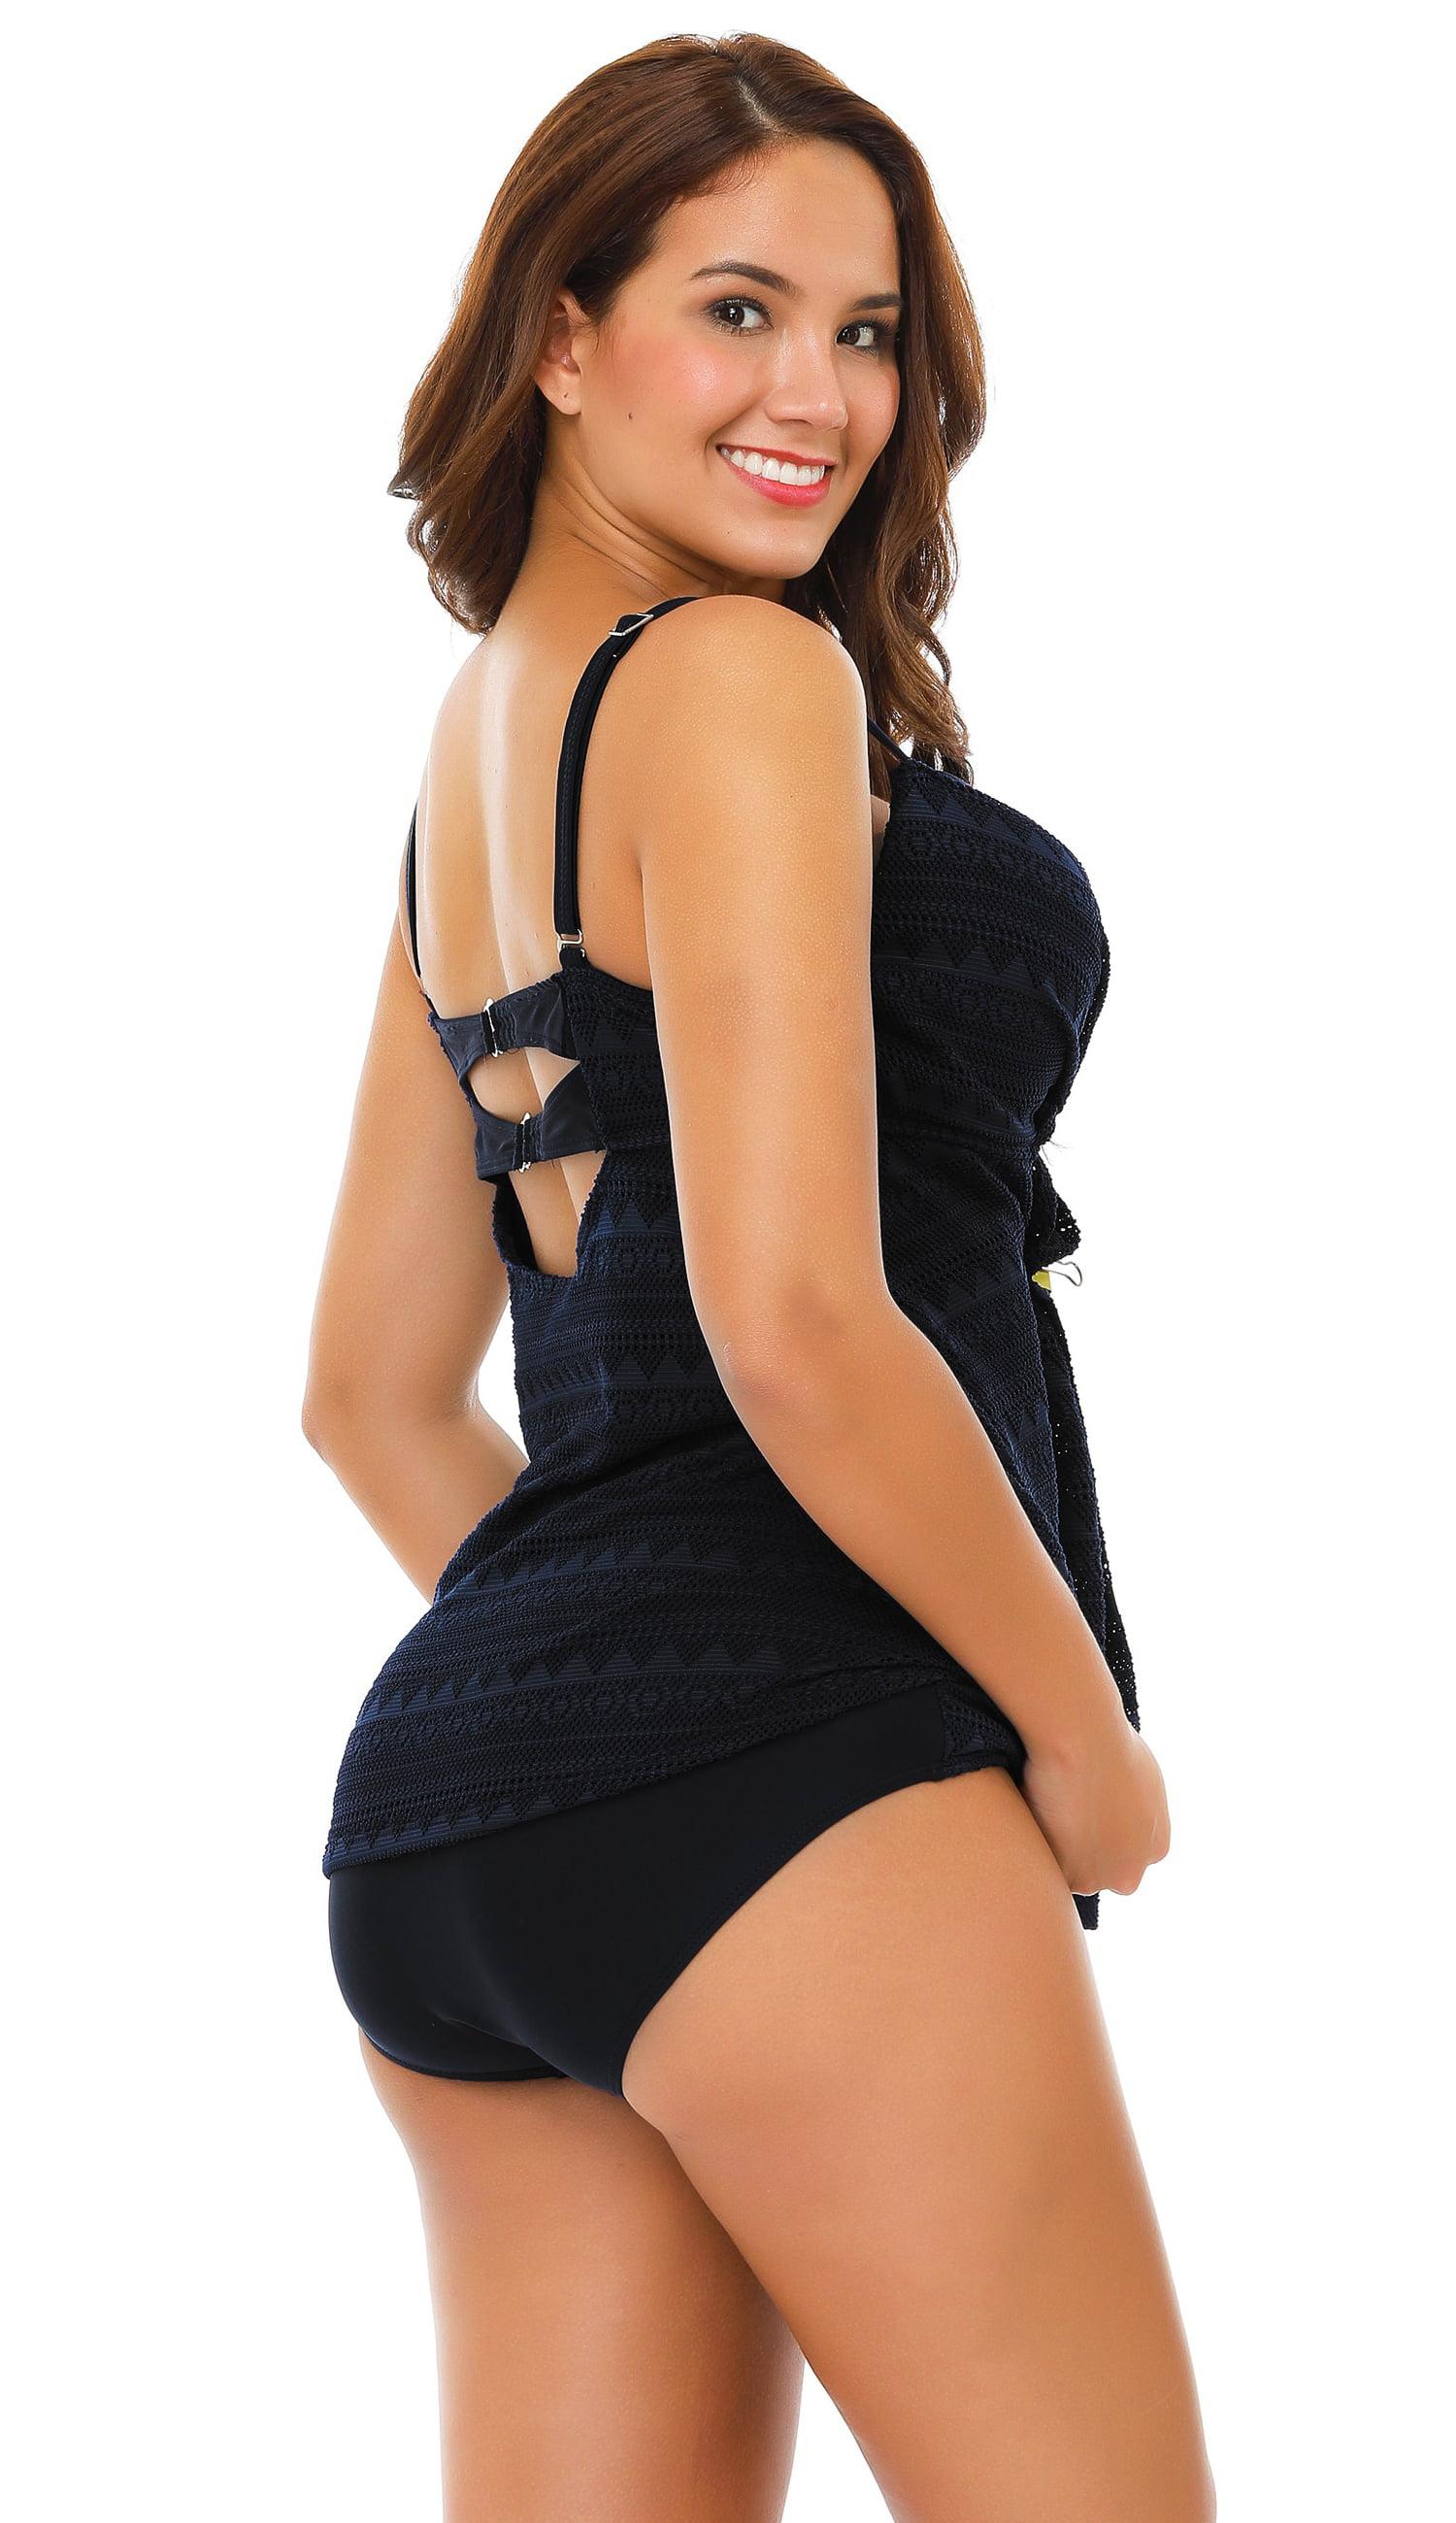 72eb83aca7704 SENFLOCO - Senfloco Women Plus Size Swimwear Tankini Set Sexy 2pcs Swimsuit  Layer Design Bathing Suit with Bra Top (Black, L-4XL) - Walmart.com